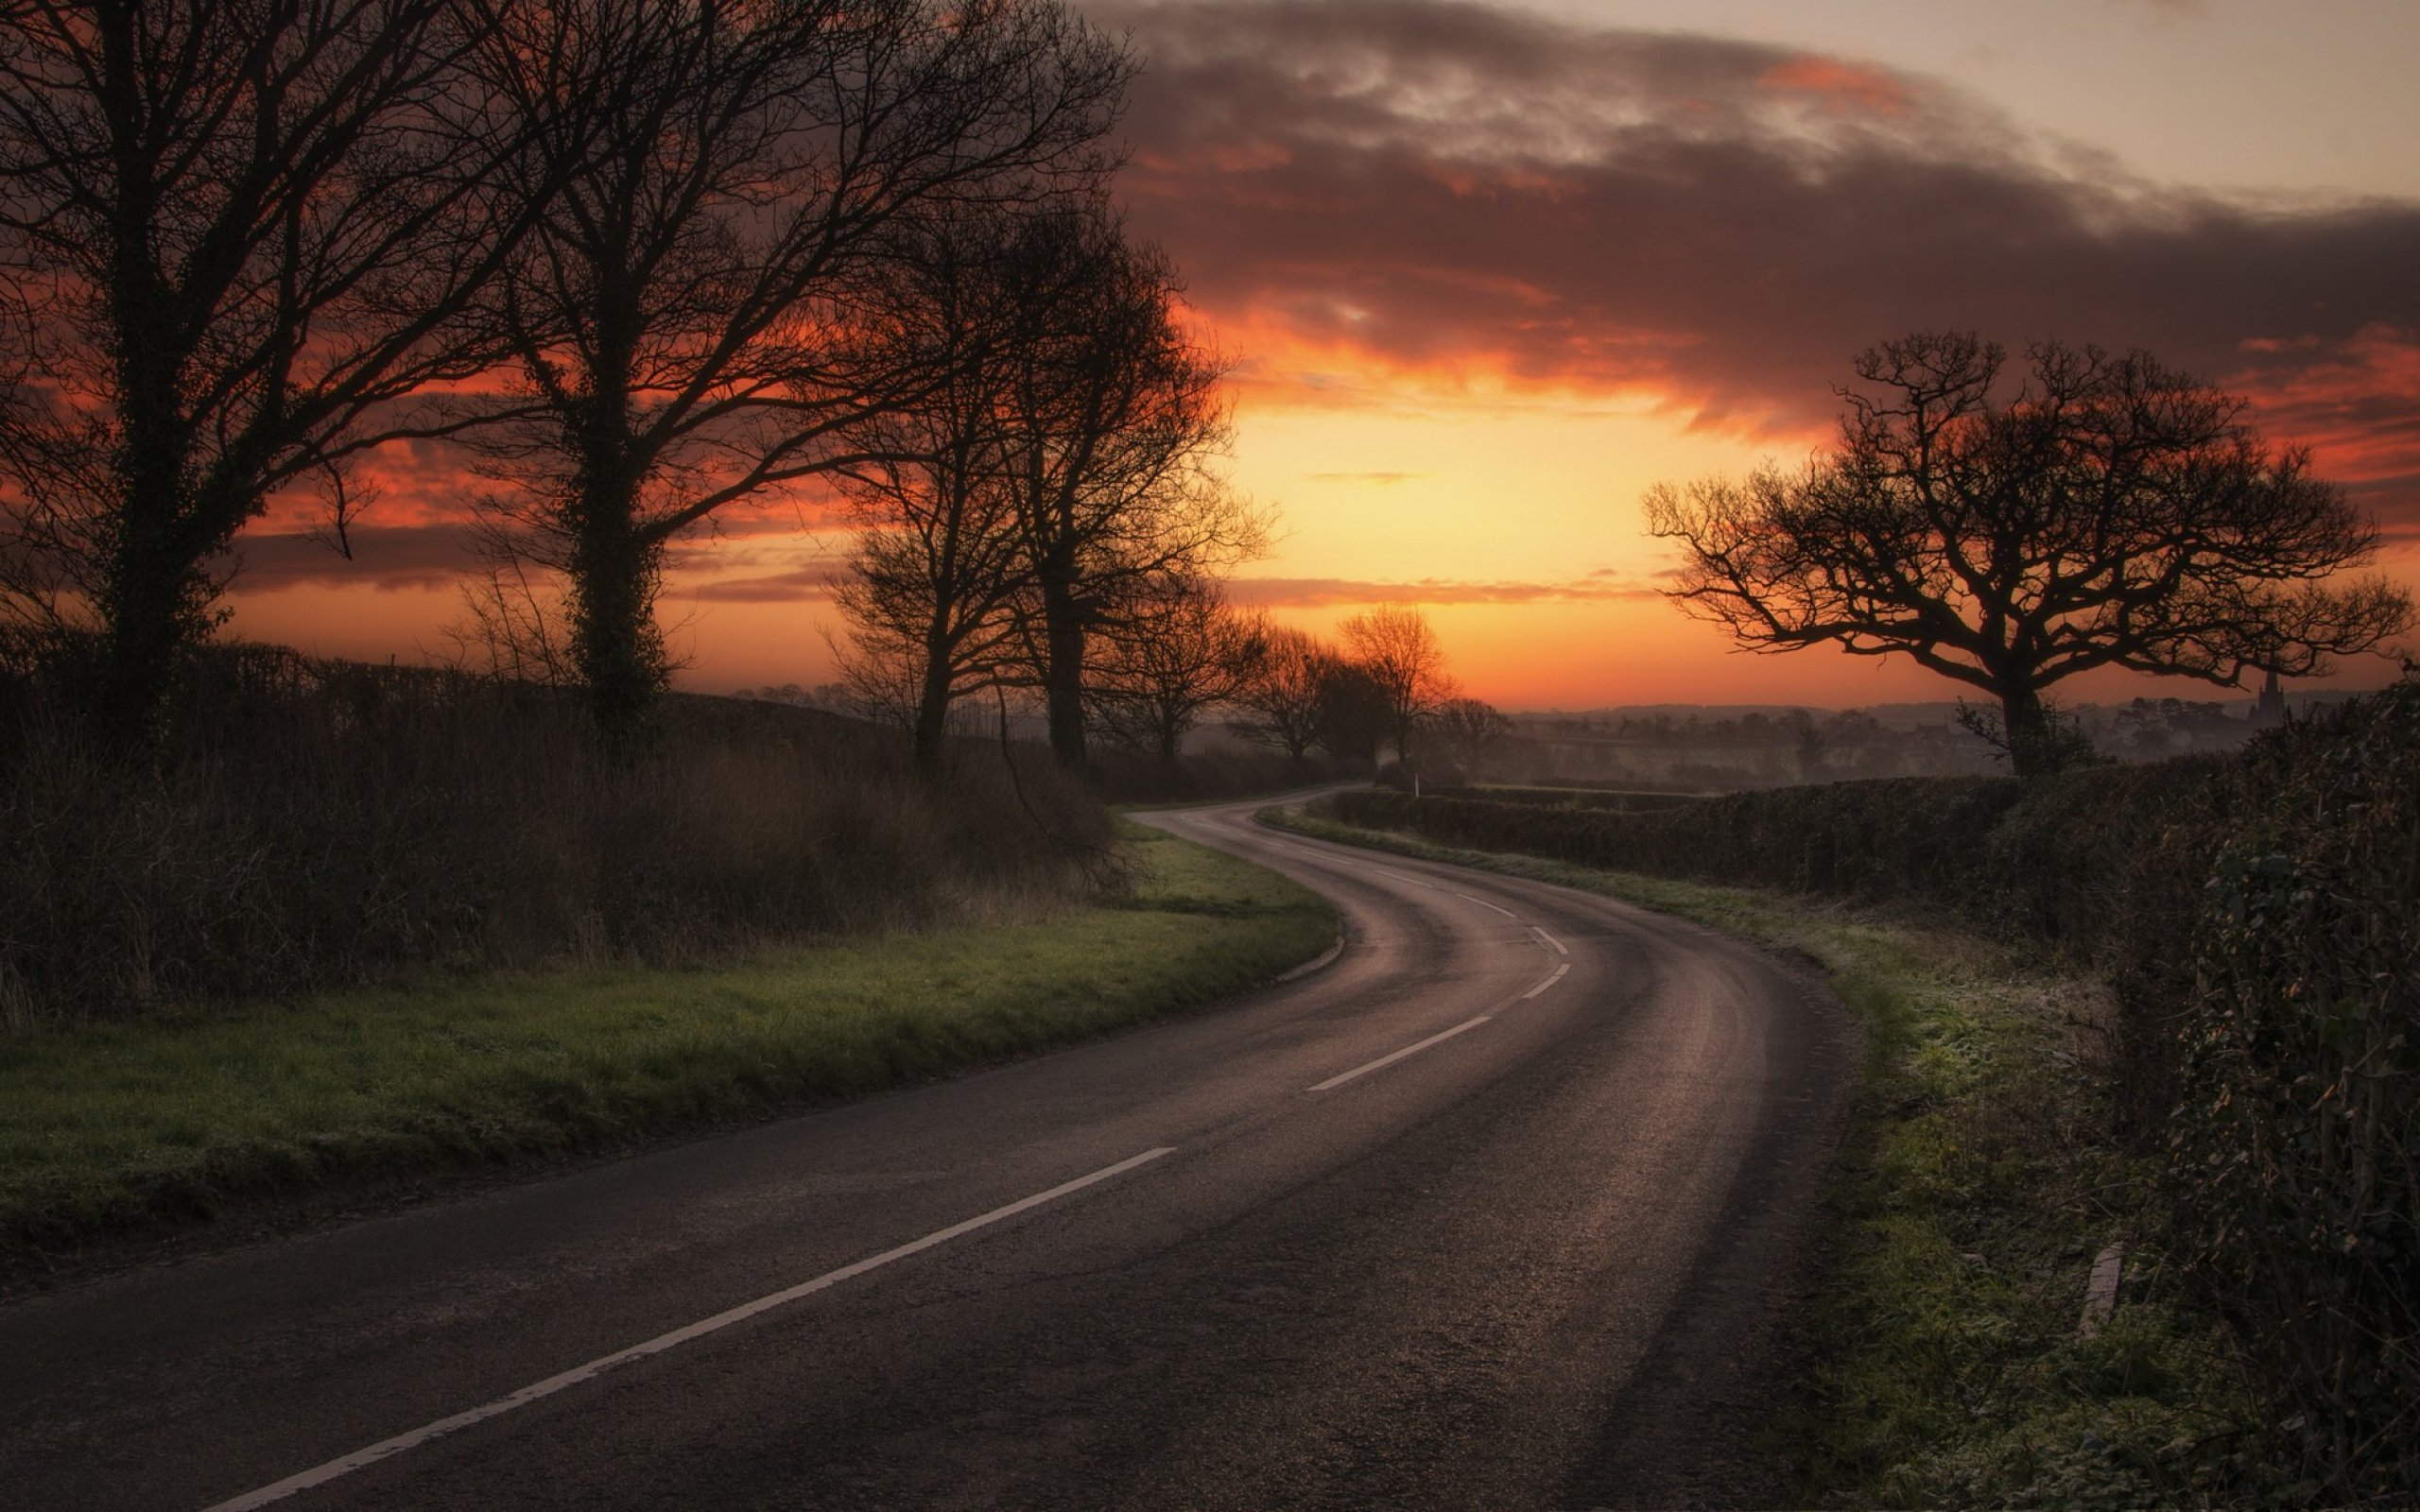 Road Sunset Wallpaper